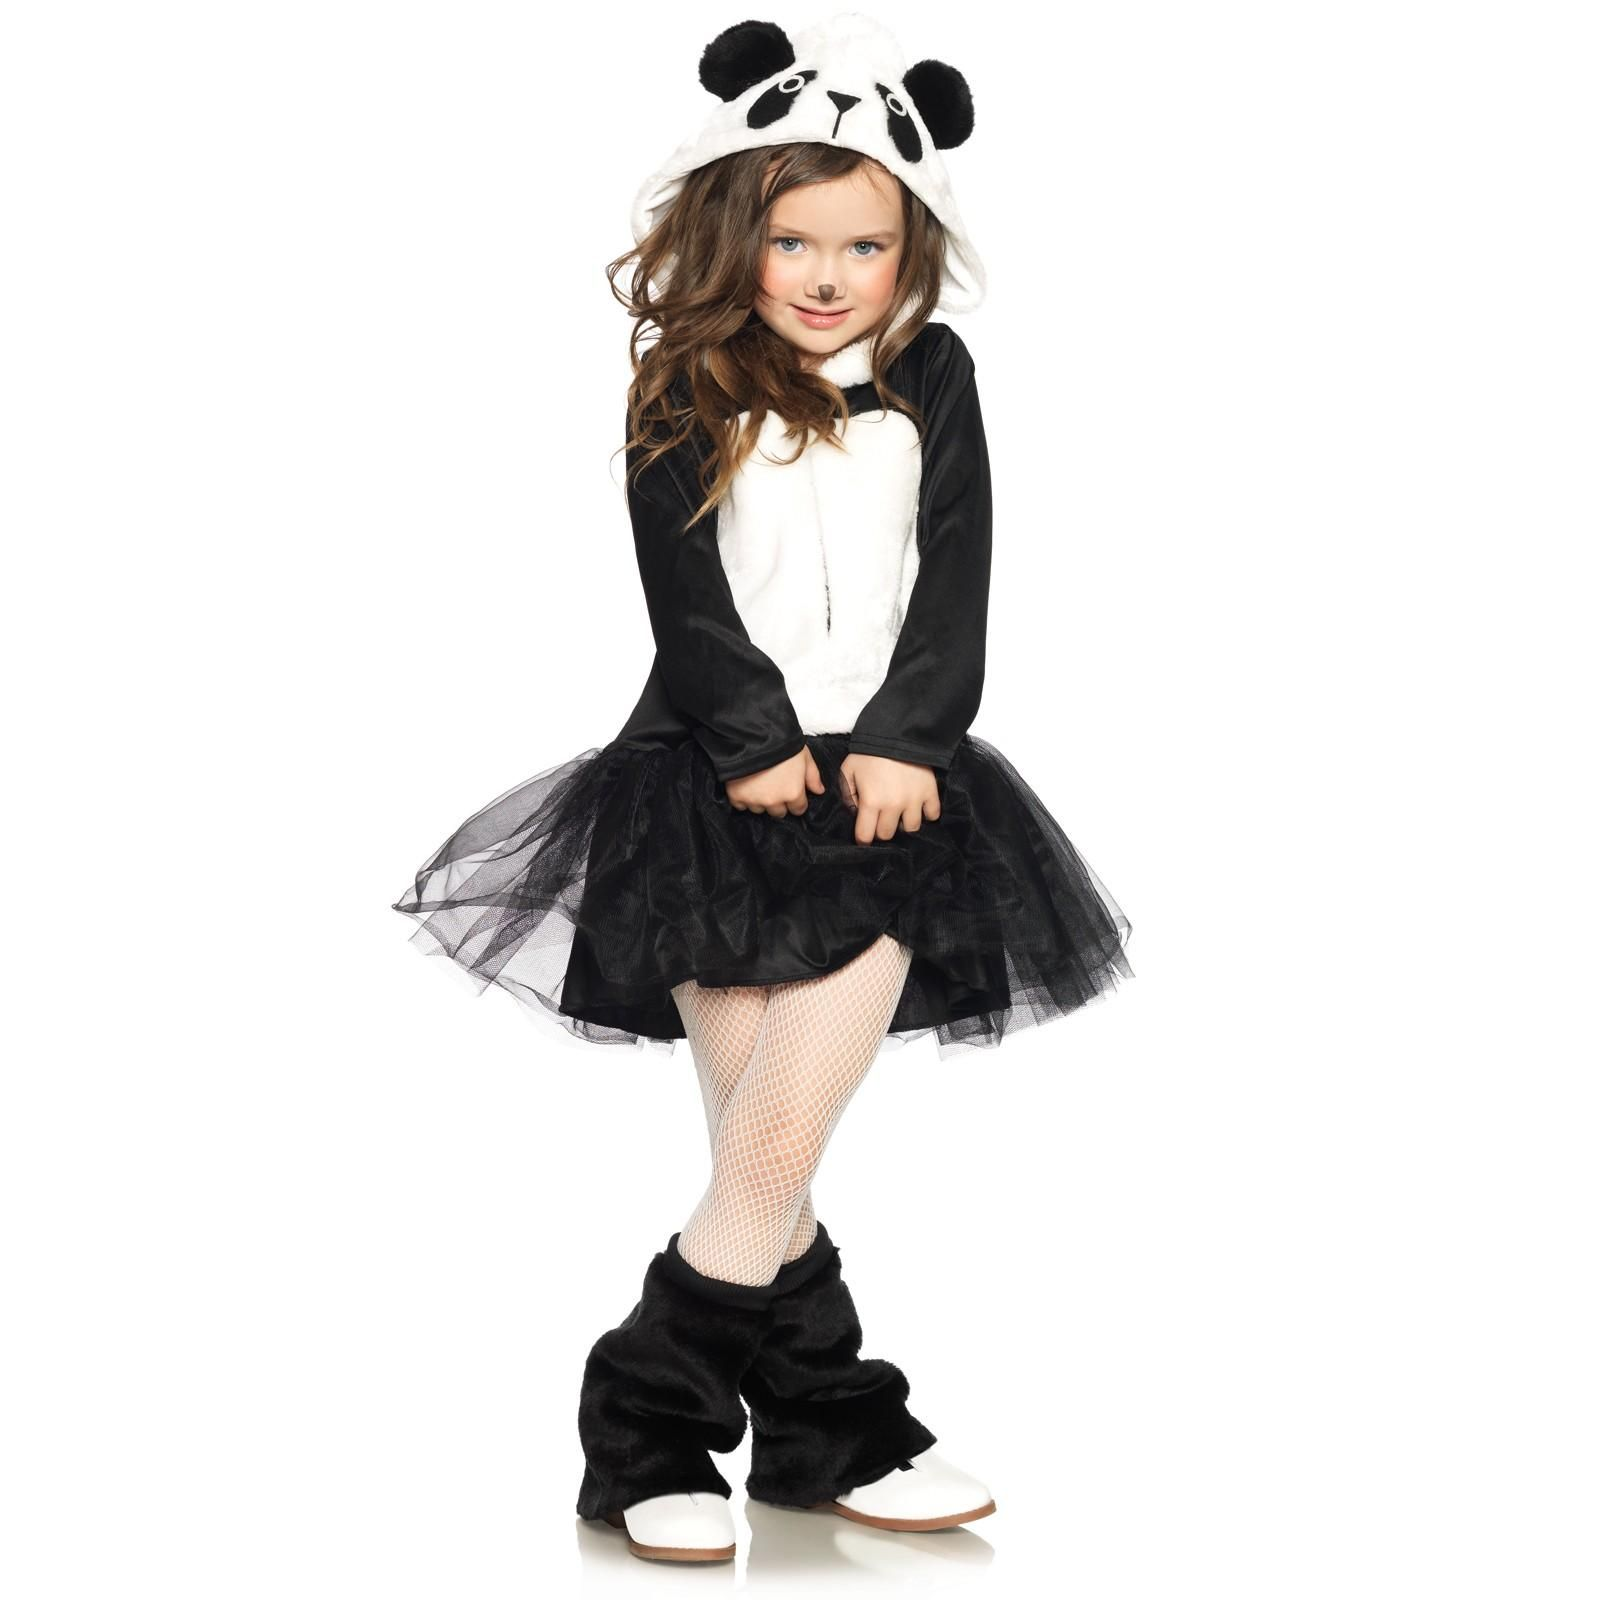 precious panda child costume from costume express on catalog spree my personal digital mall